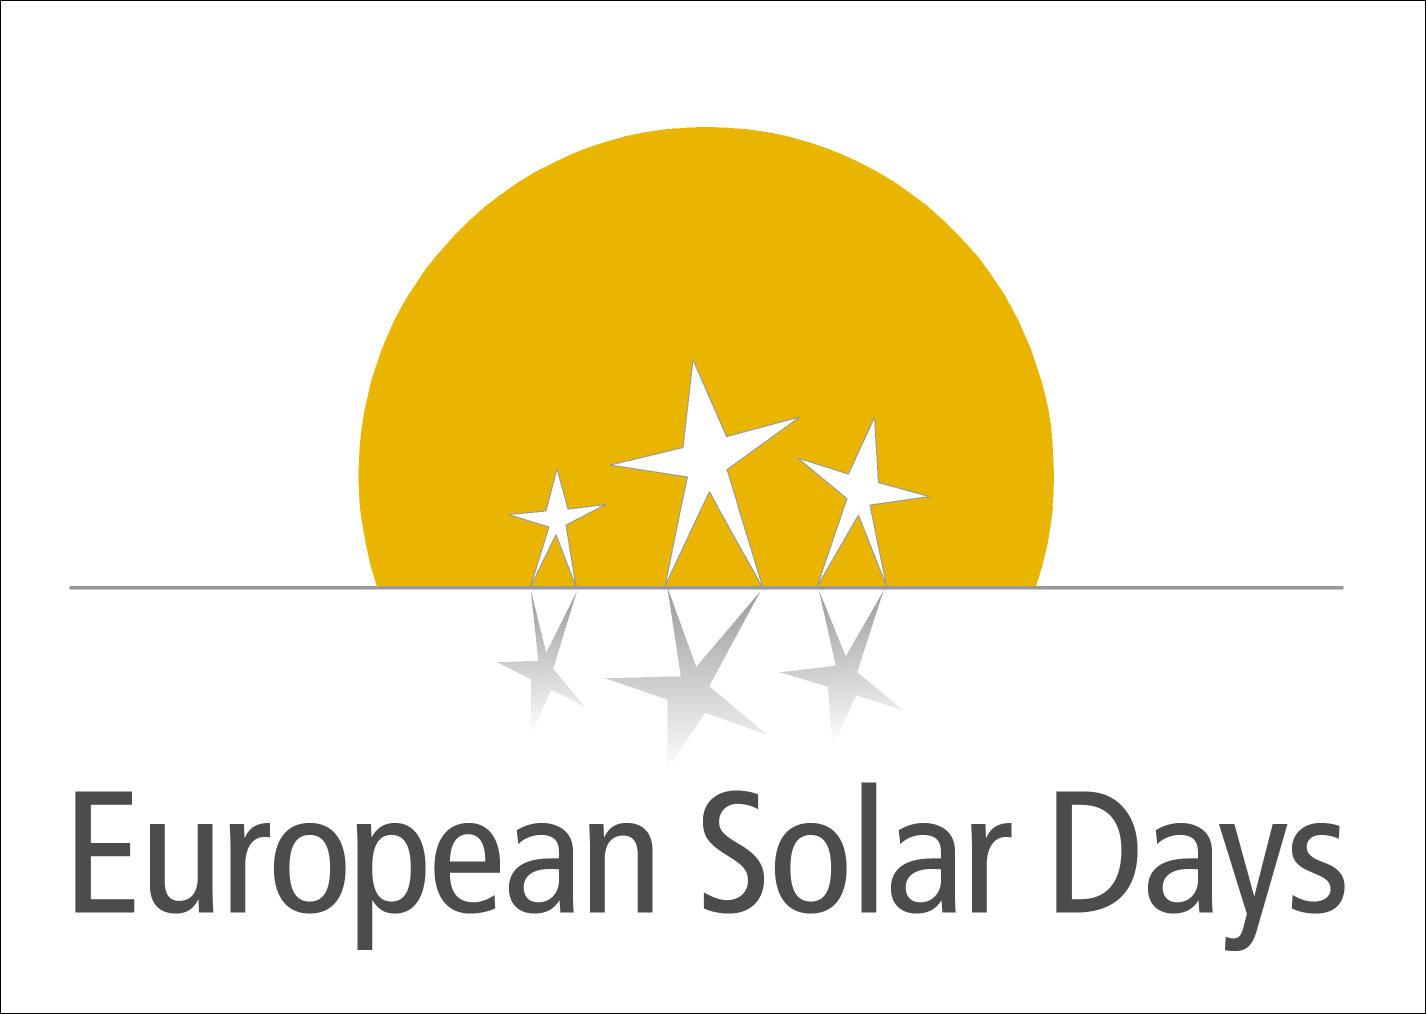 European Solar Days